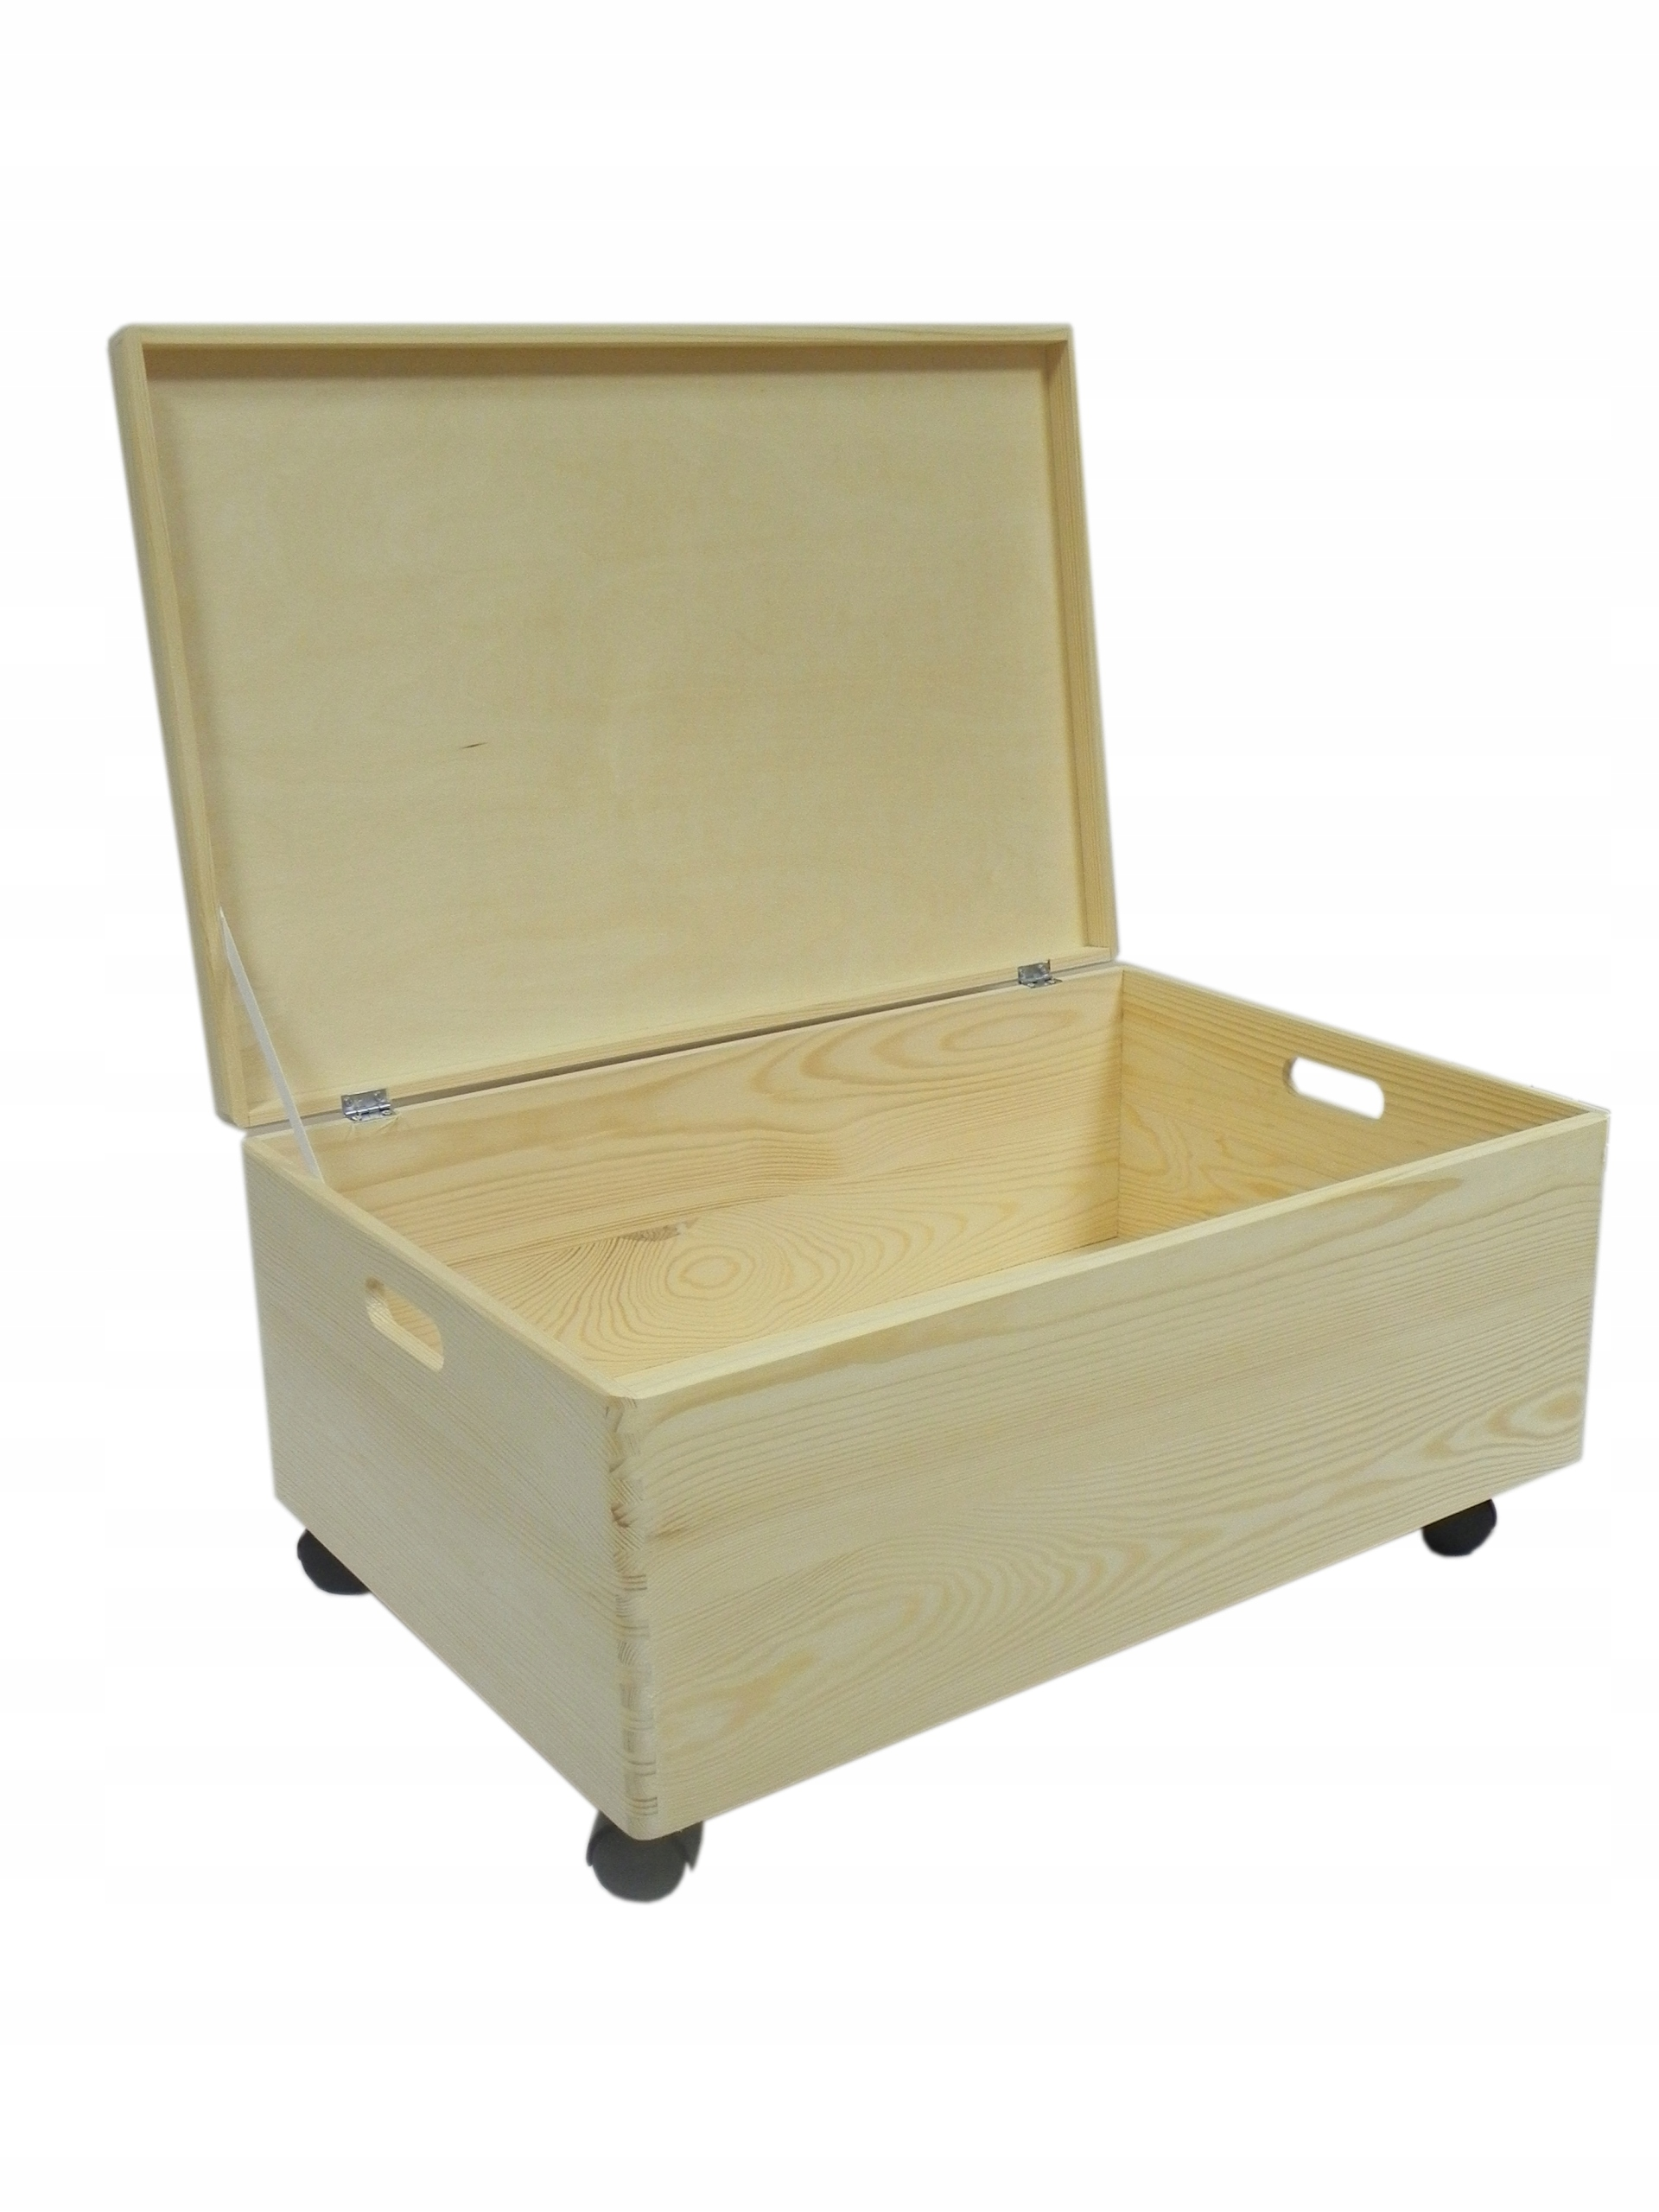 Drevený box na kolieskach, box, kufor 60x40